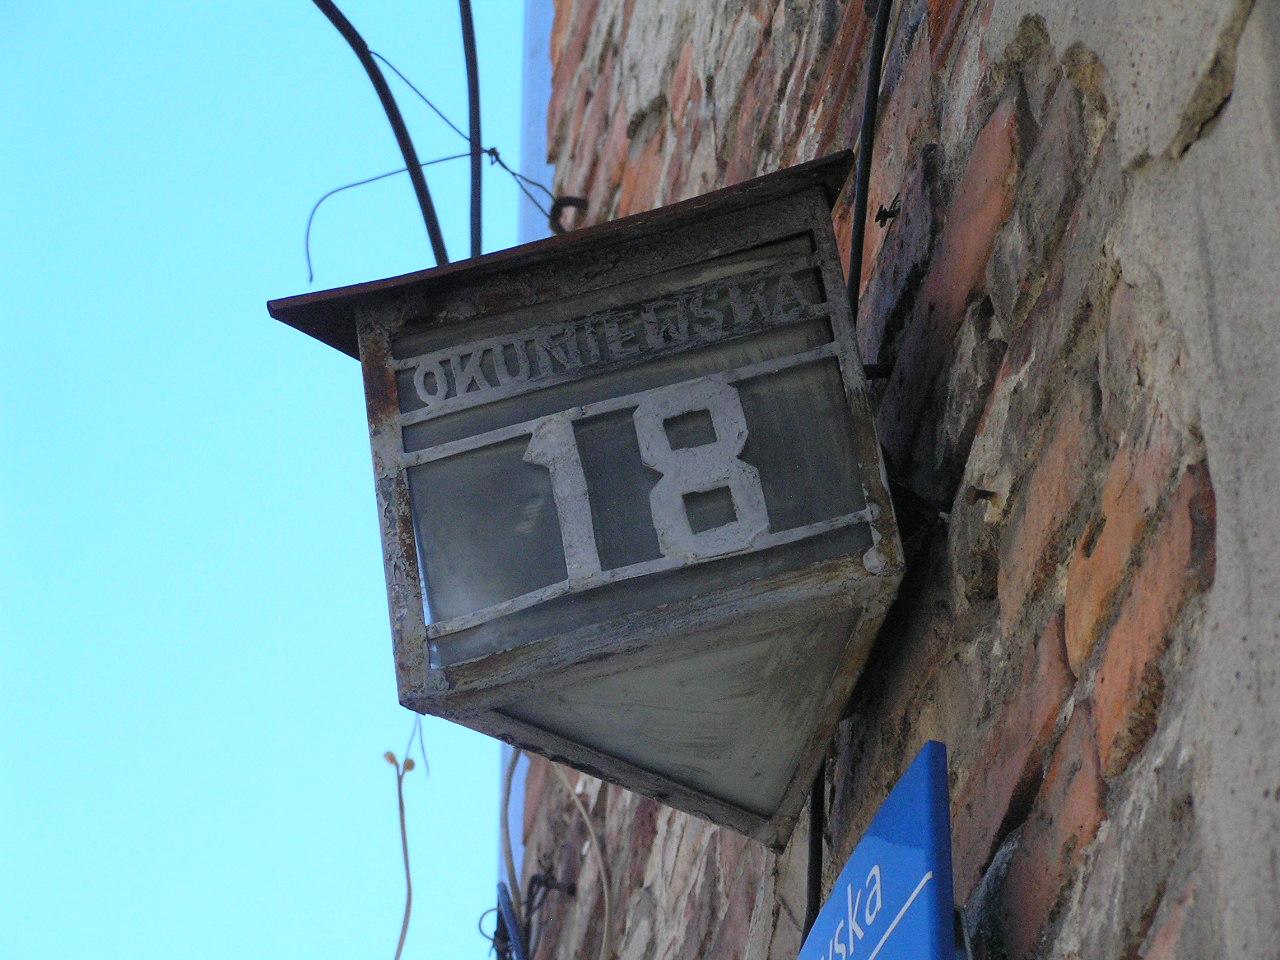 Latarenka adresowa - Okuniewska 18